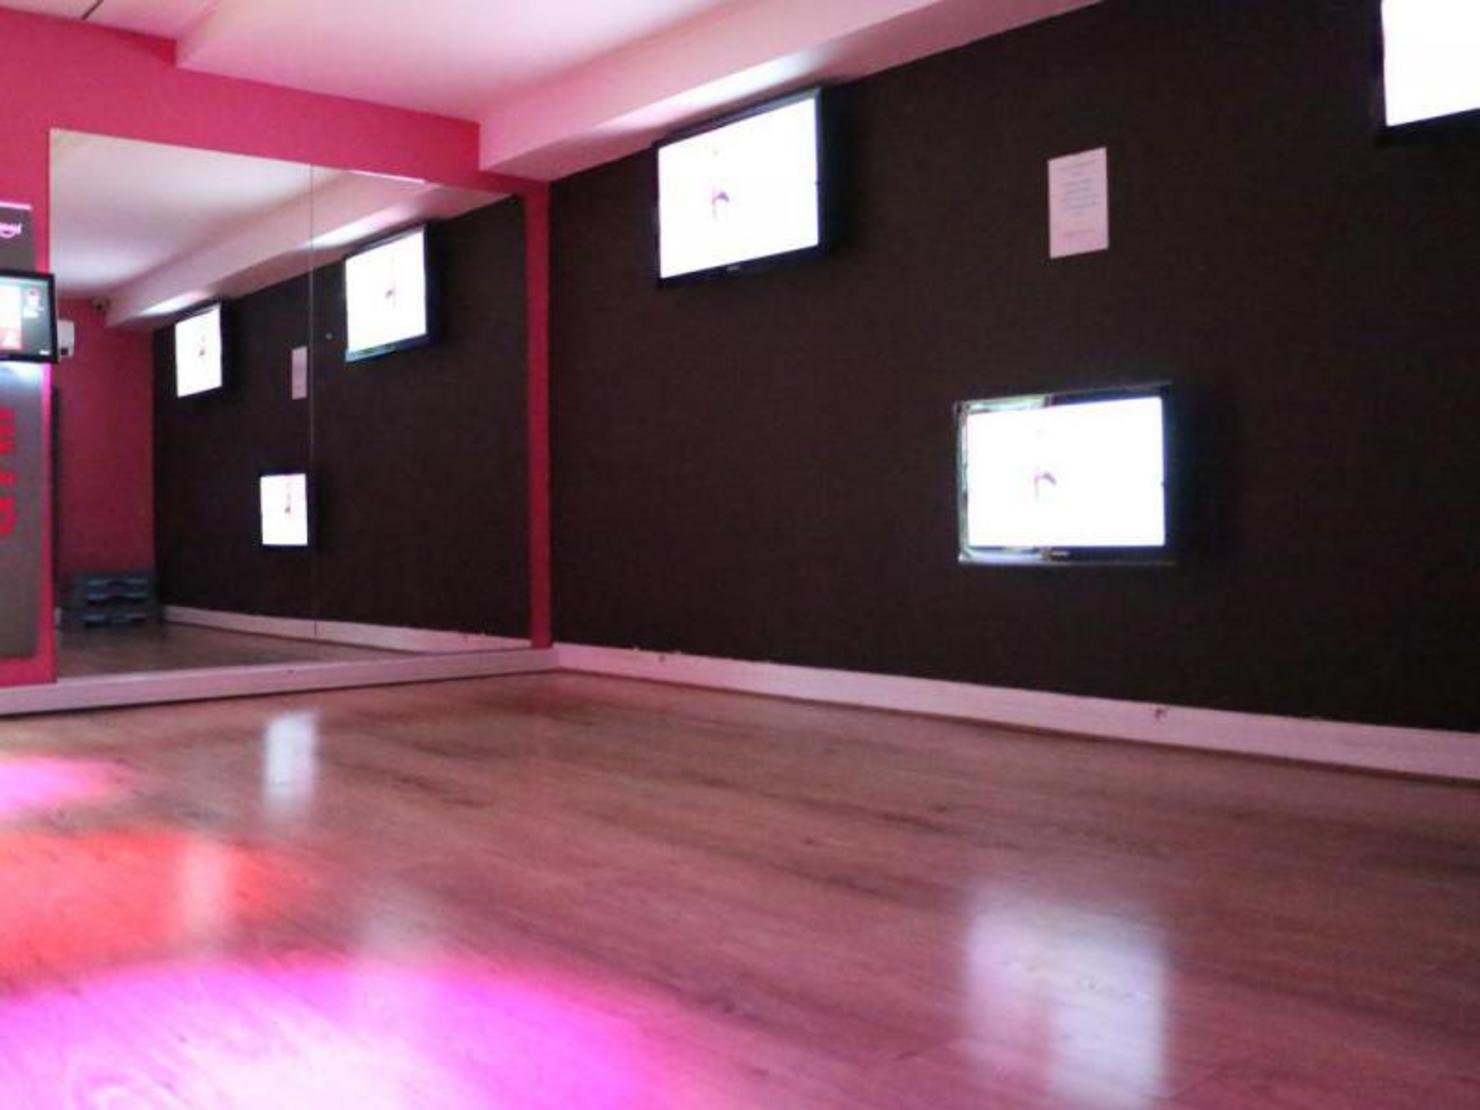 keep cool marseille la valentine tarifs avis horaires essai gratuit. Black Bedroom Furniture Sets. Home Design Ideas